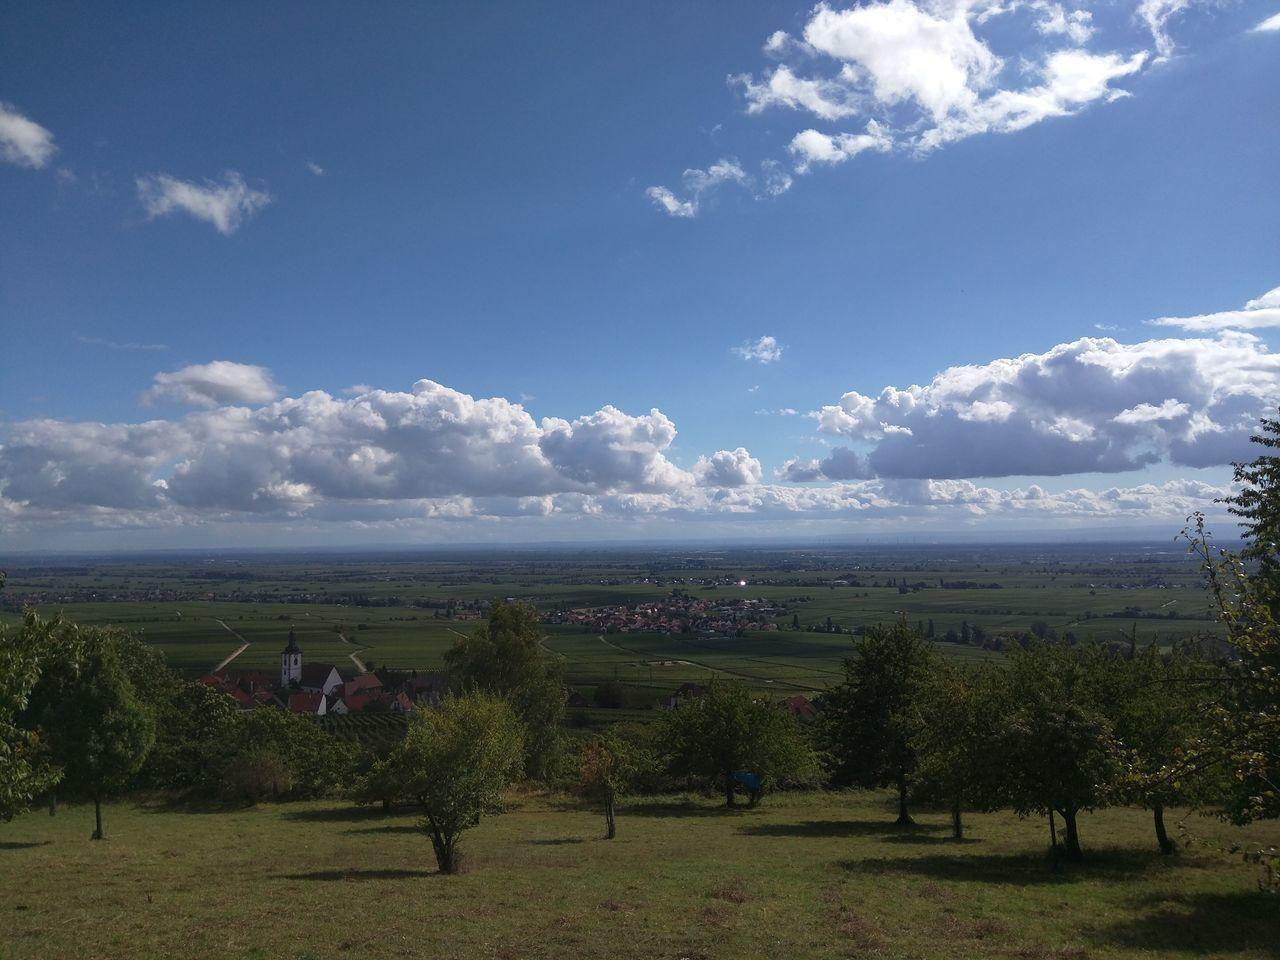 TakeoverContrast Landscape Pfalz Landschaft Nature Field Cloud - Sky Green Color First Eyeem Photo Outdoors Sky